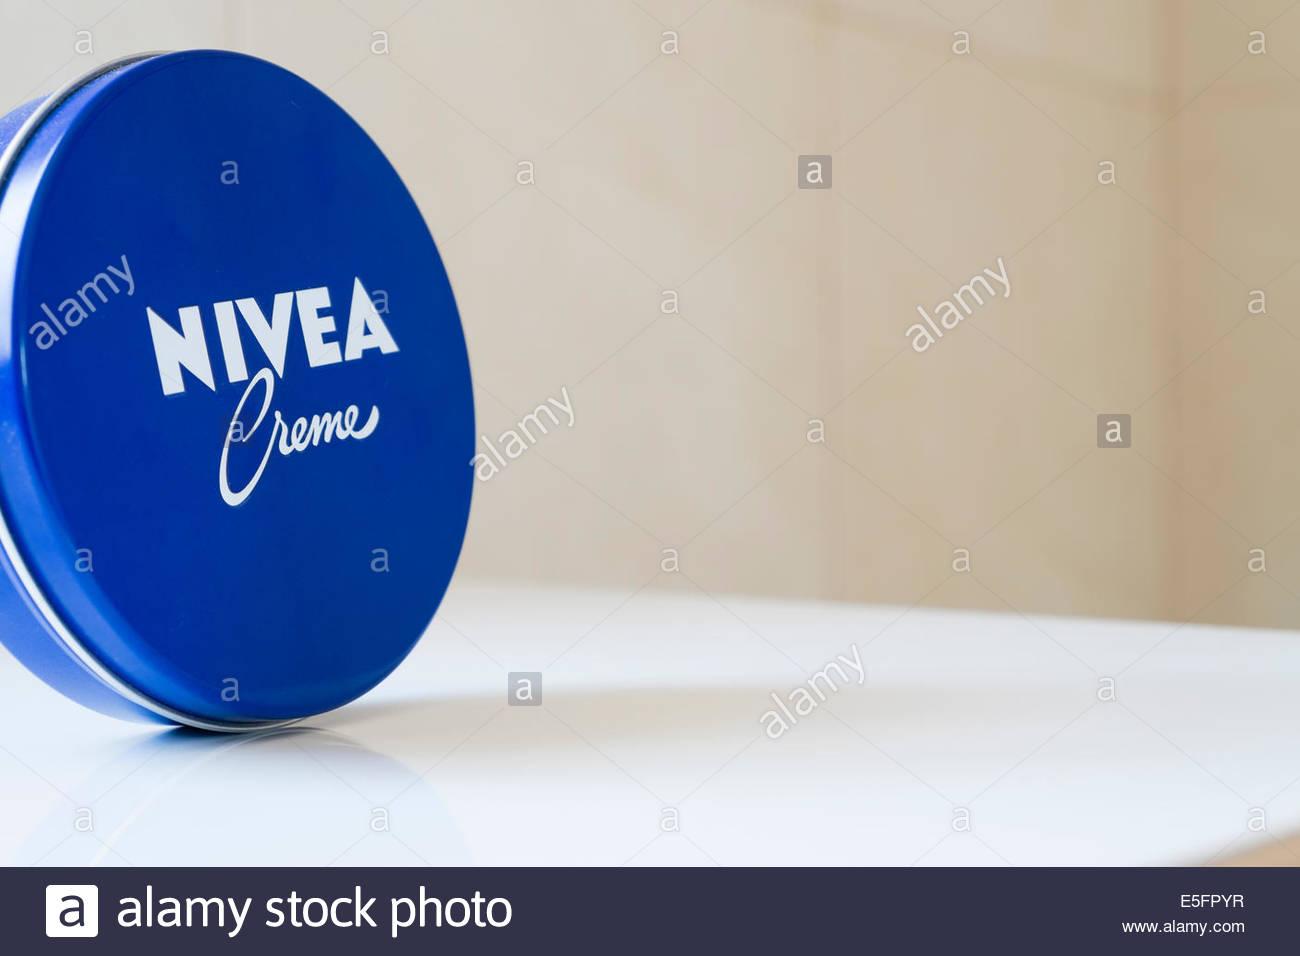 Stock Photo - A distinctive blue tin of Nivea Creme